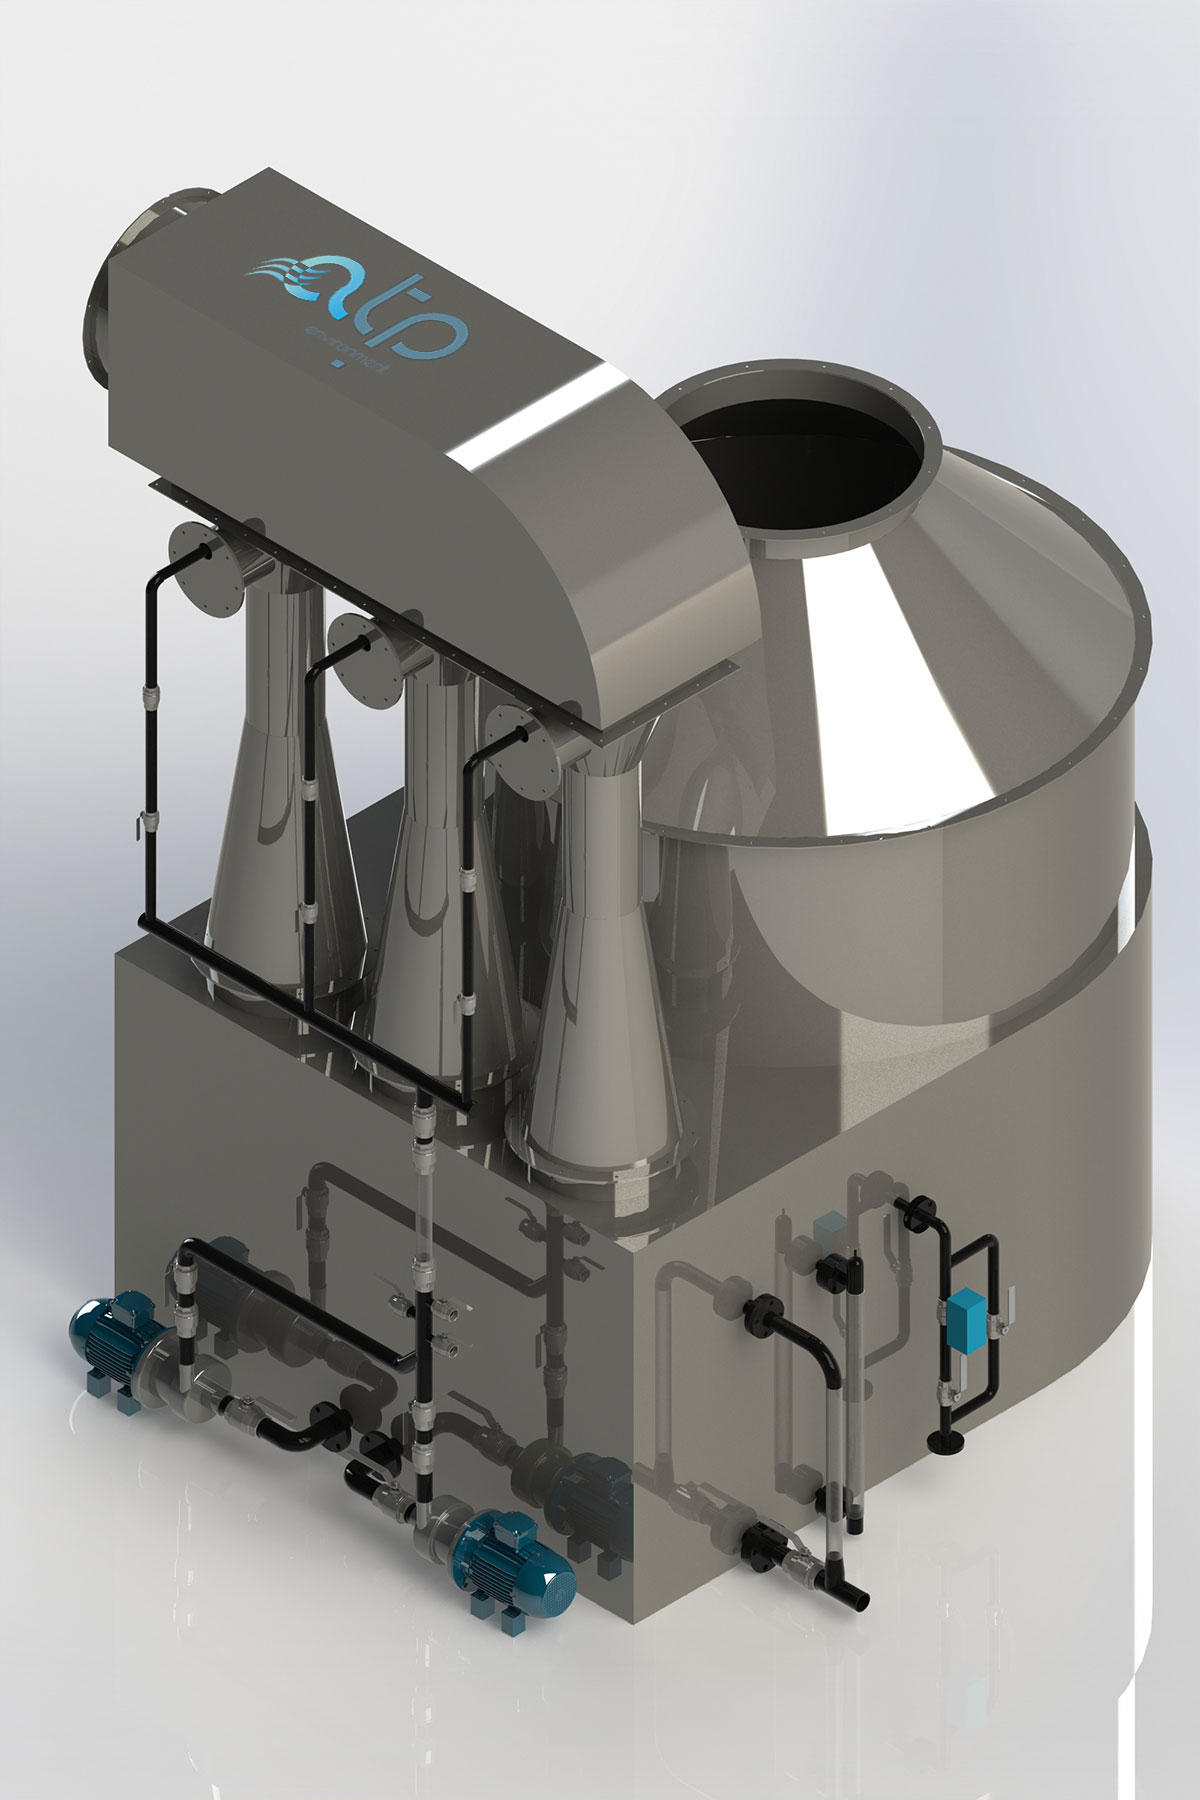 Venturi Scrubber Inox - Industrial Air Treatment